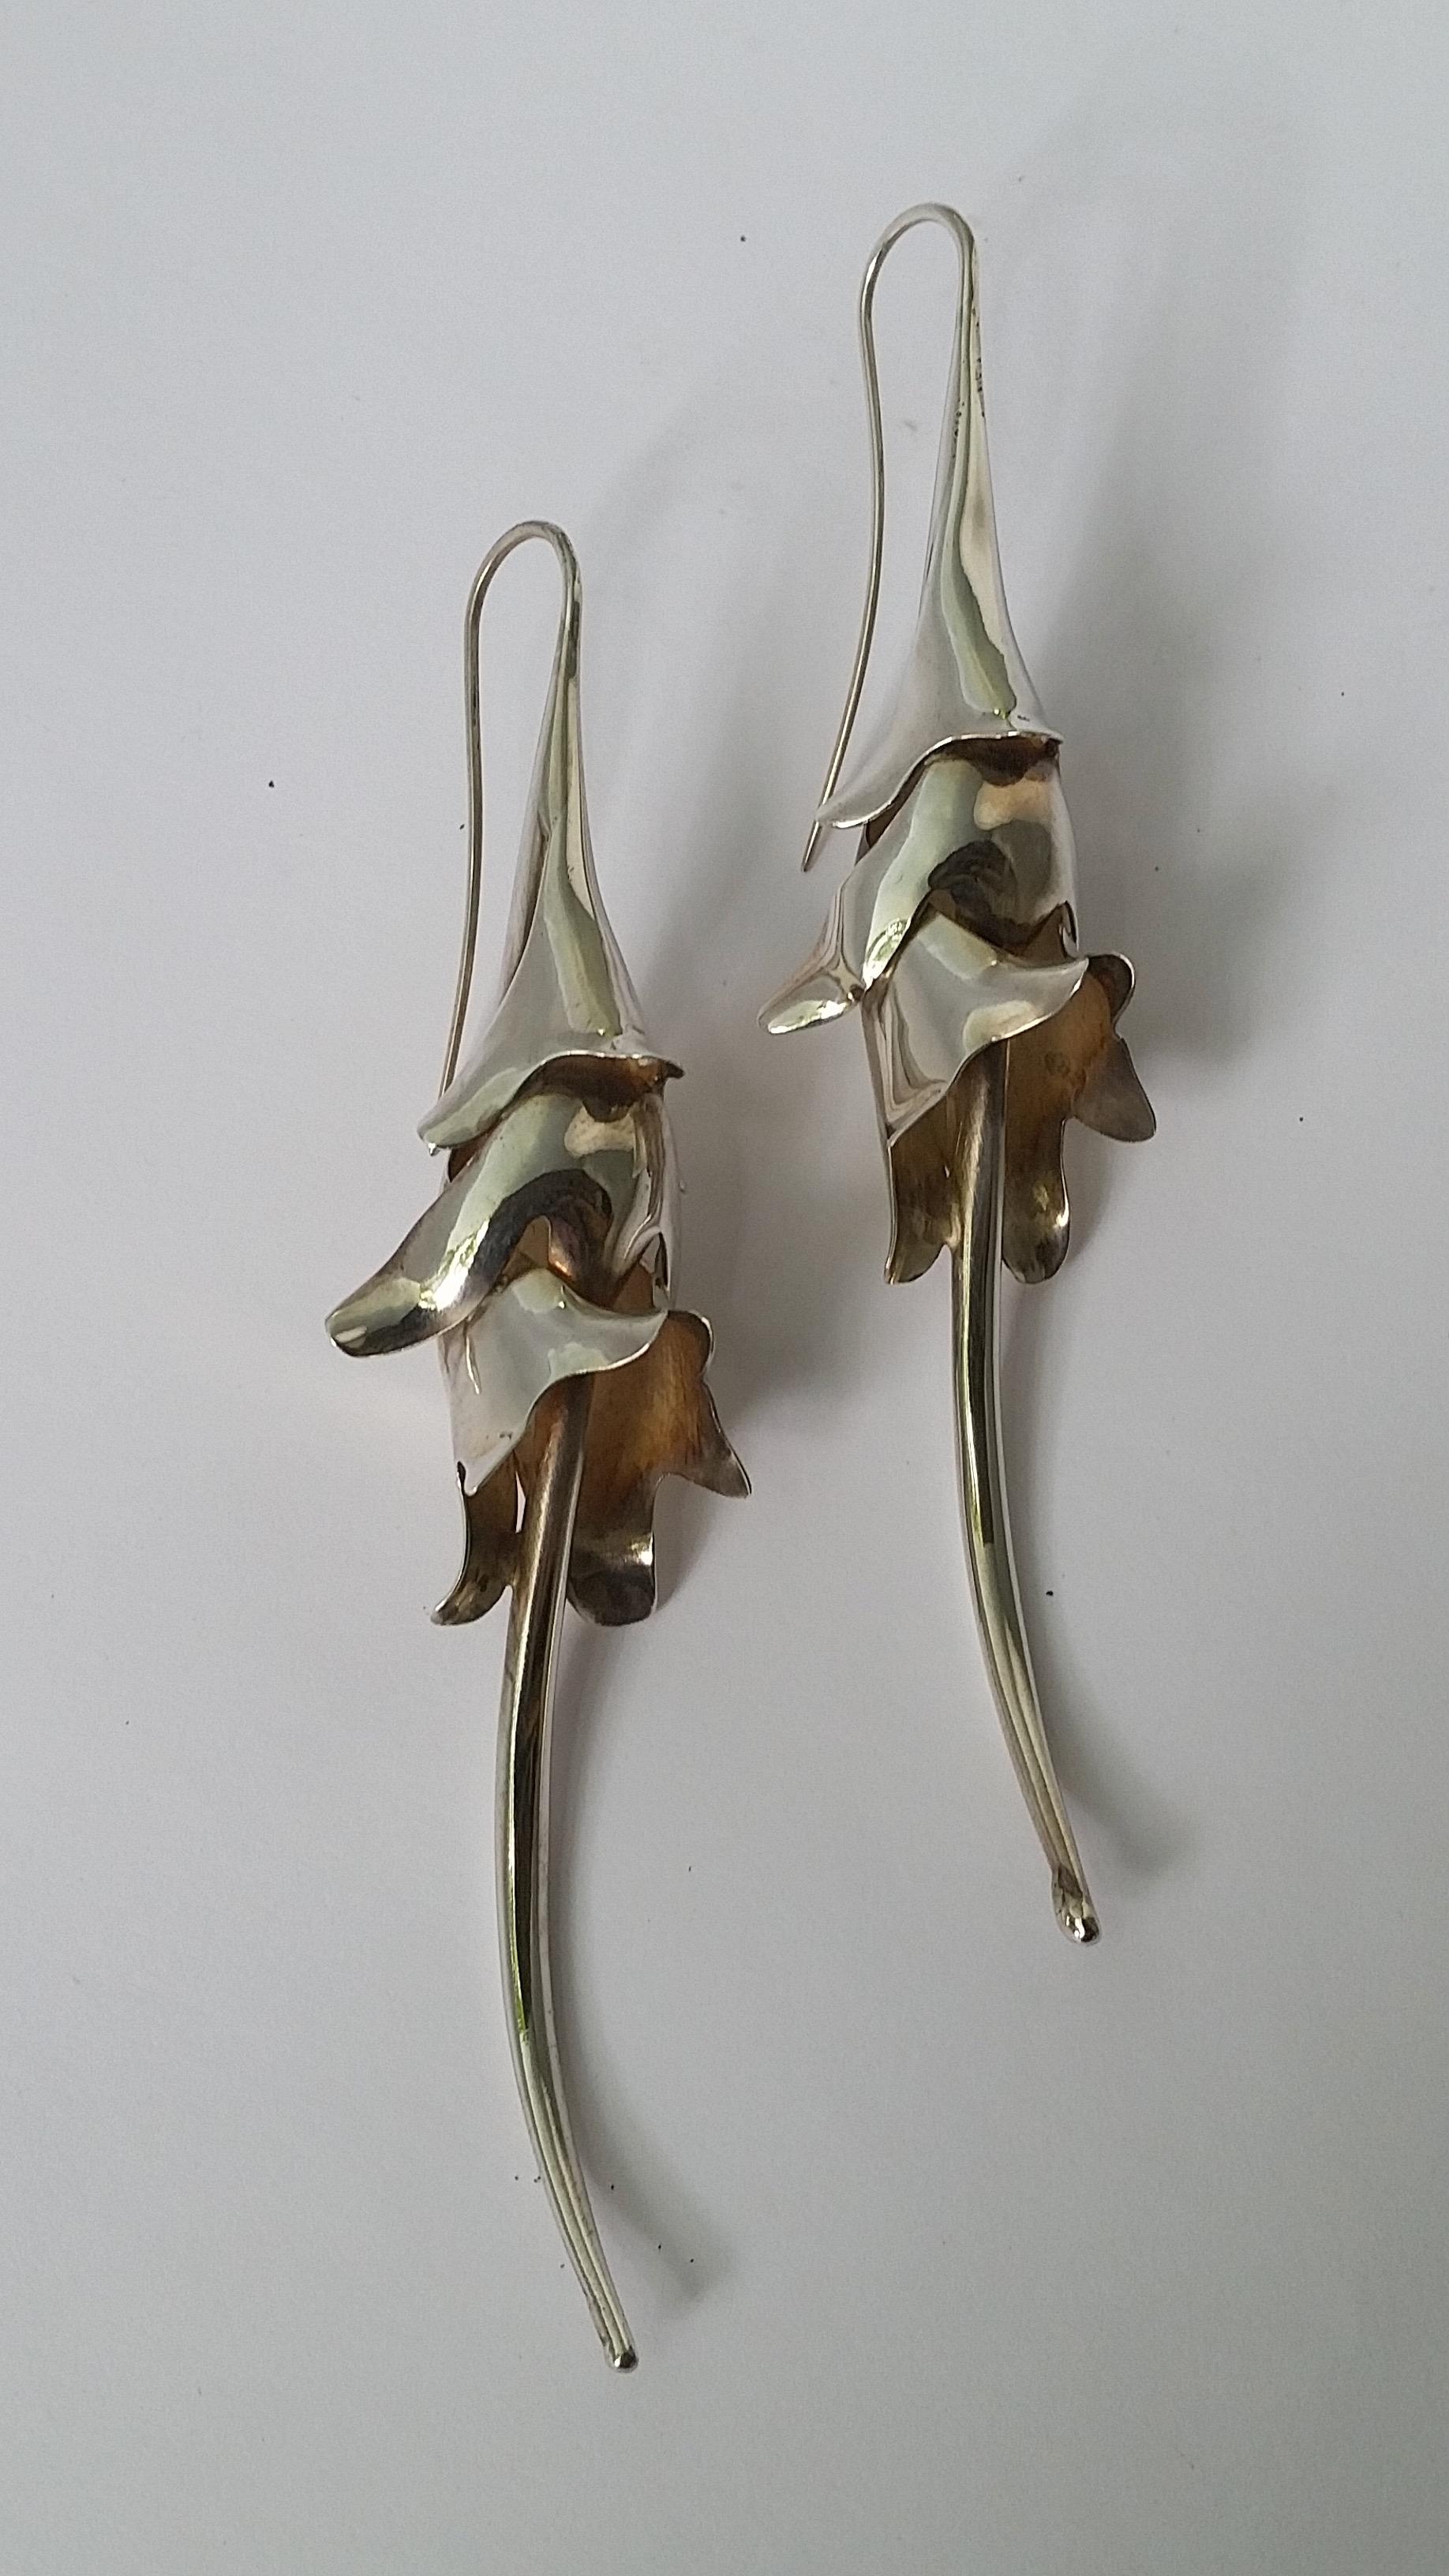 #11a.jpg   earrings..jpg